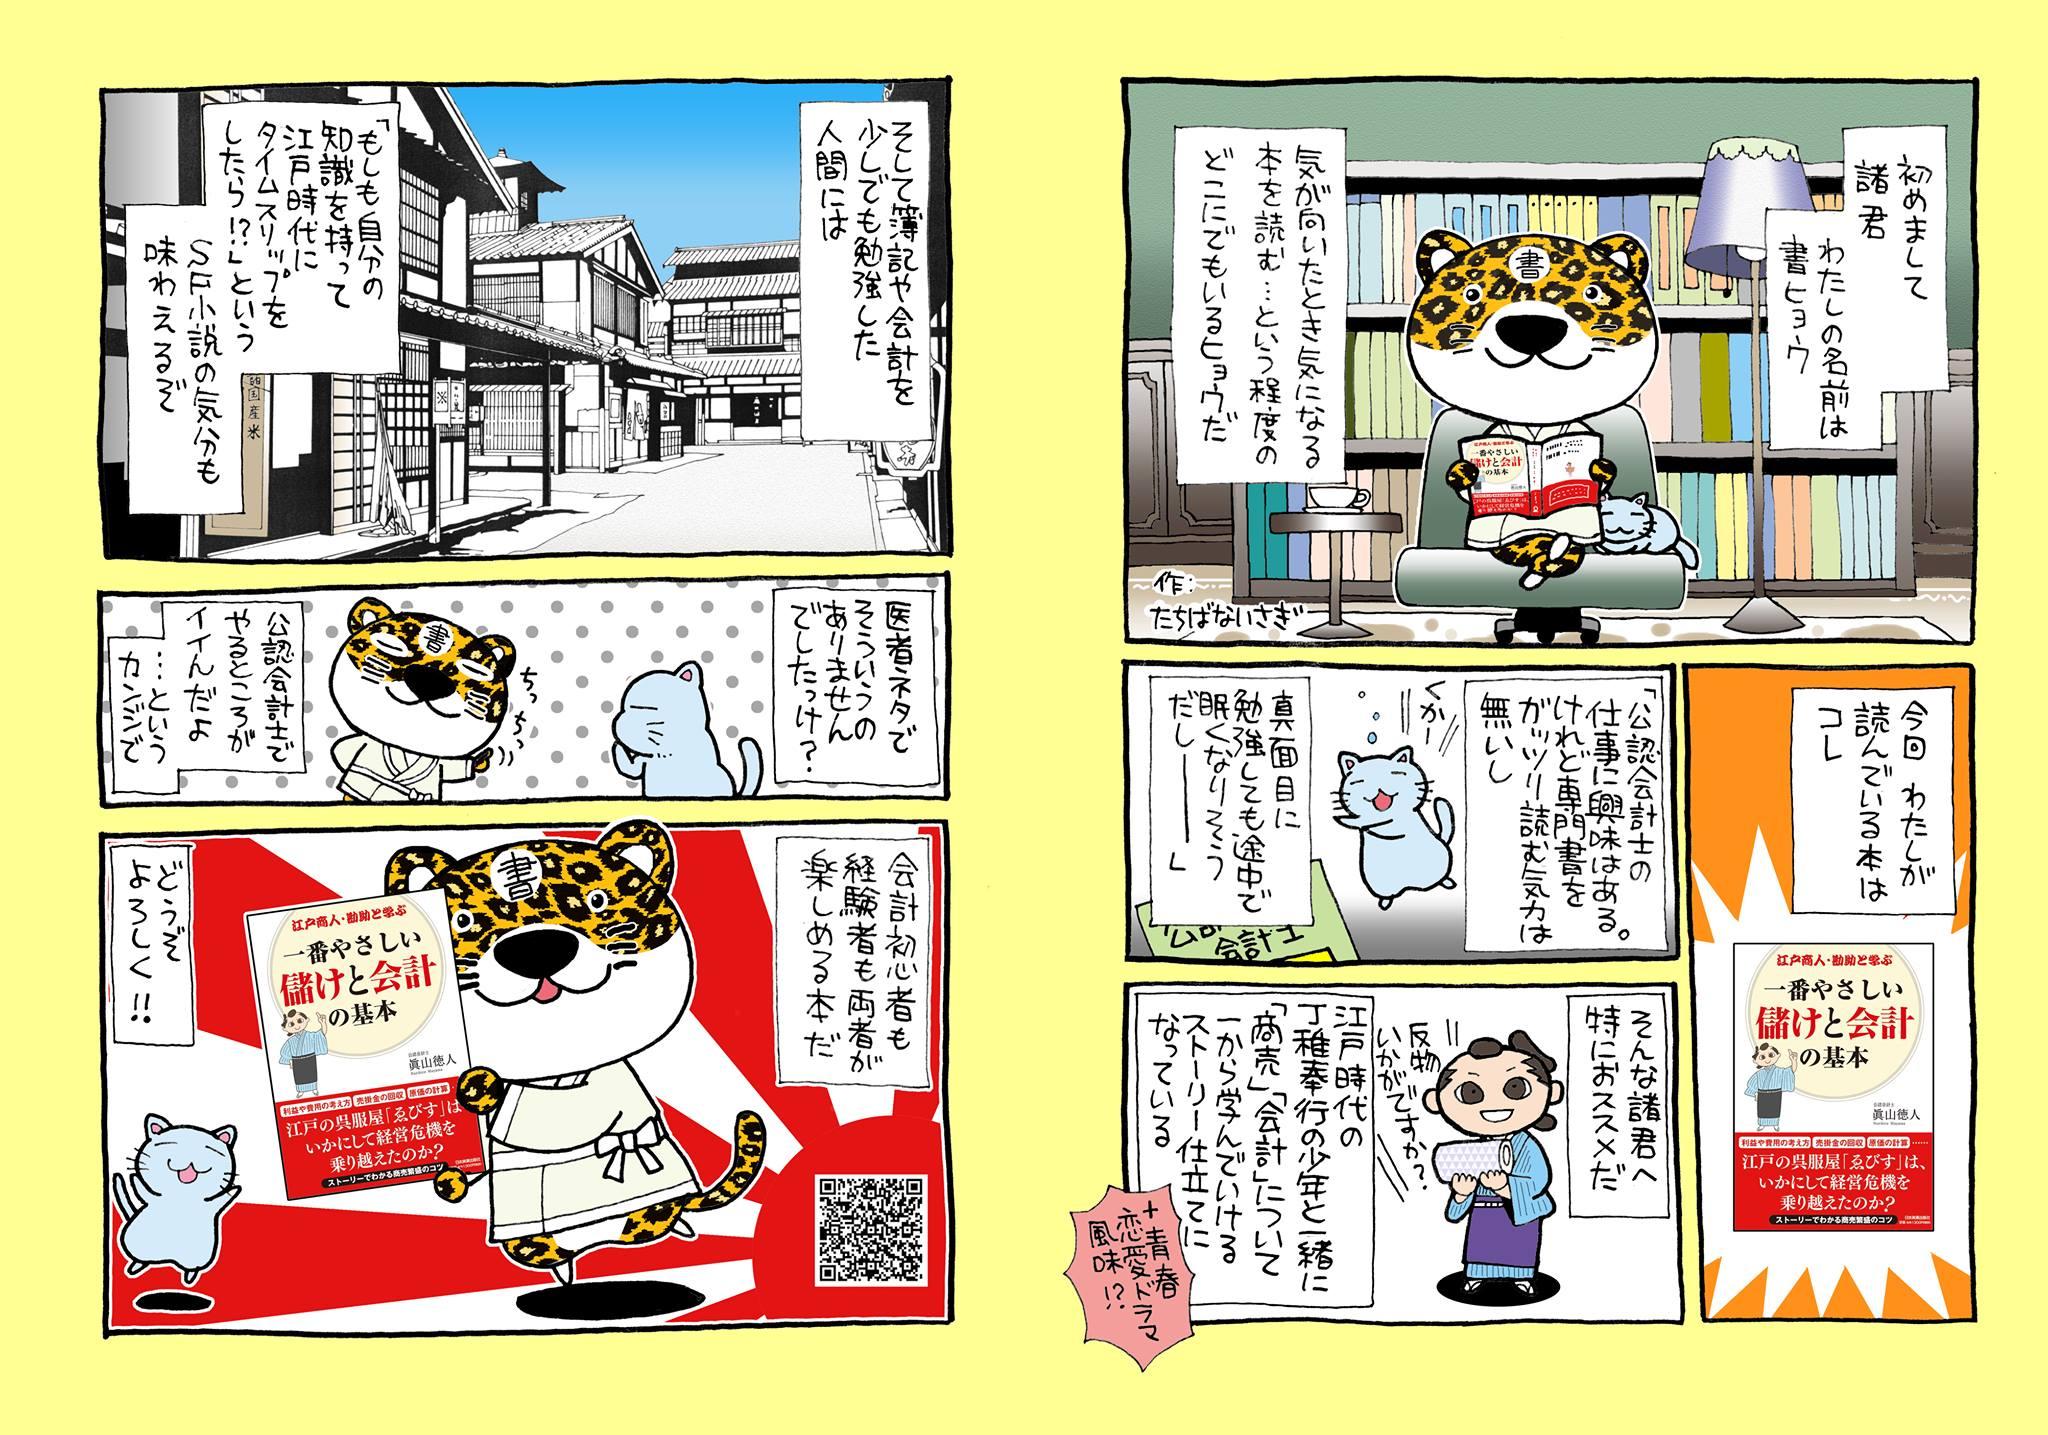 http://blogs.bizmakoto.jp/mahyan-cpa/1961711_491298340975301_8916549897064210740_o.jpg